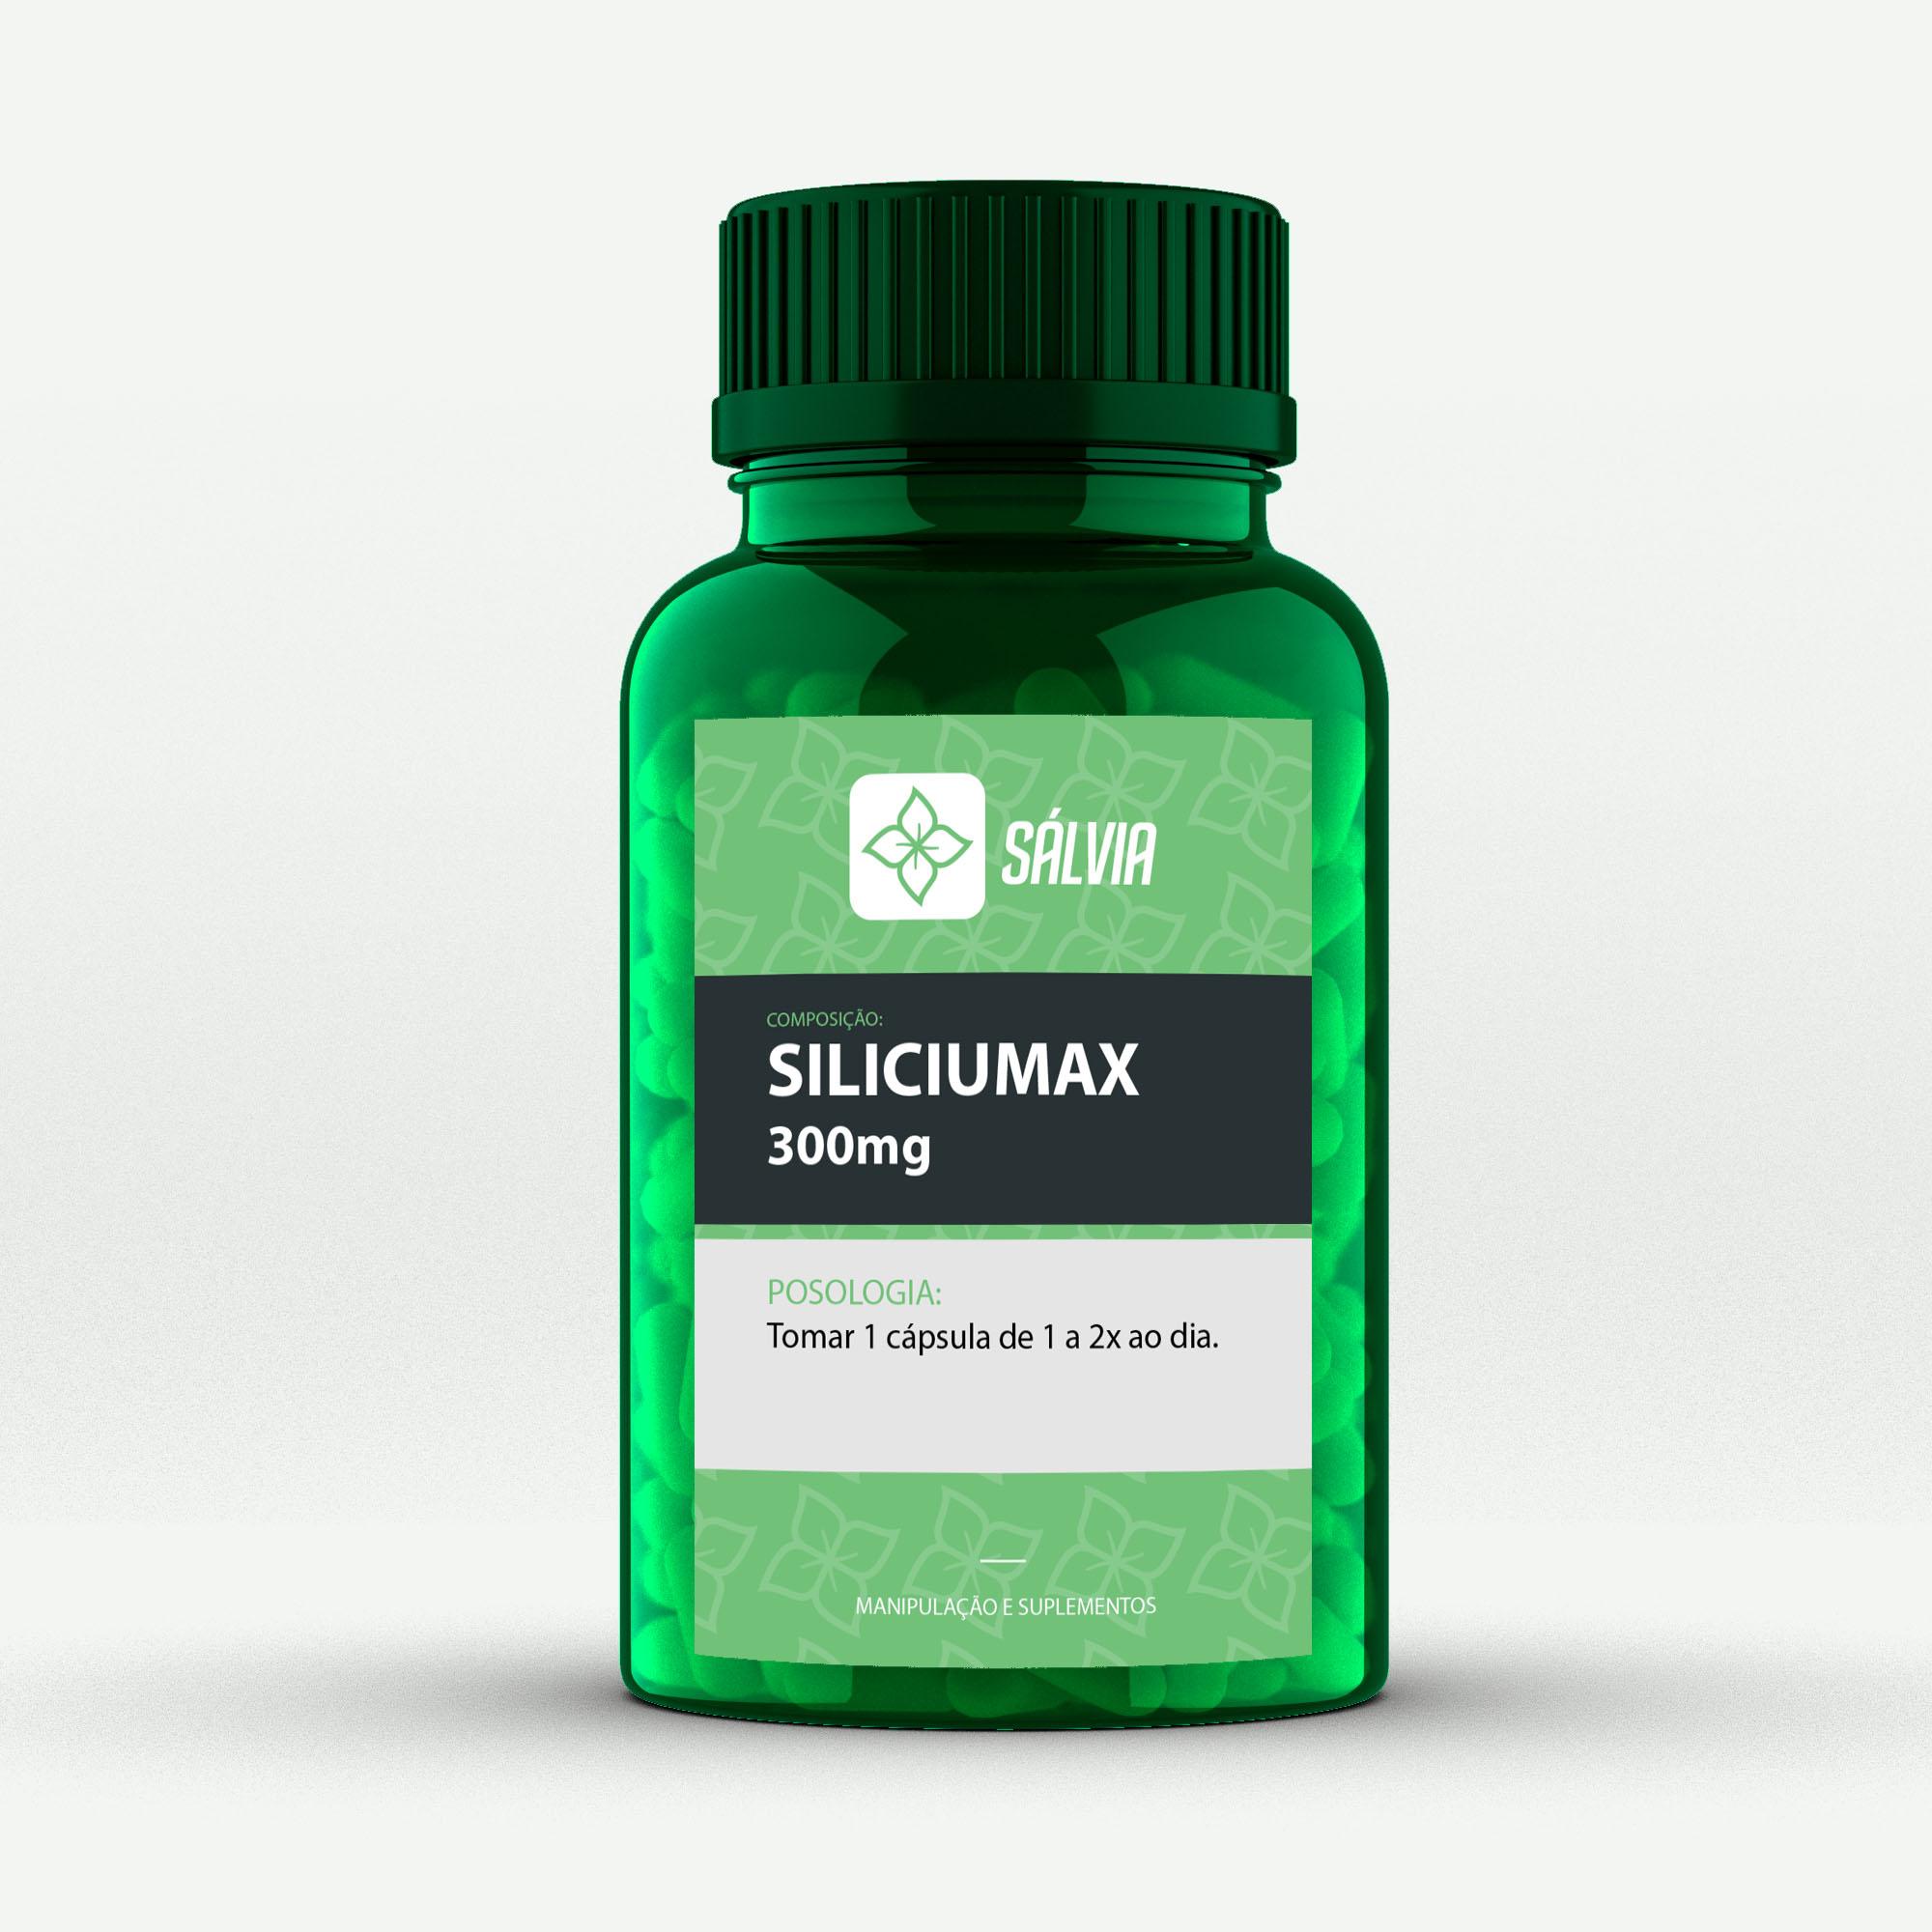 SILICIUMAX 300mg – Cápsulas